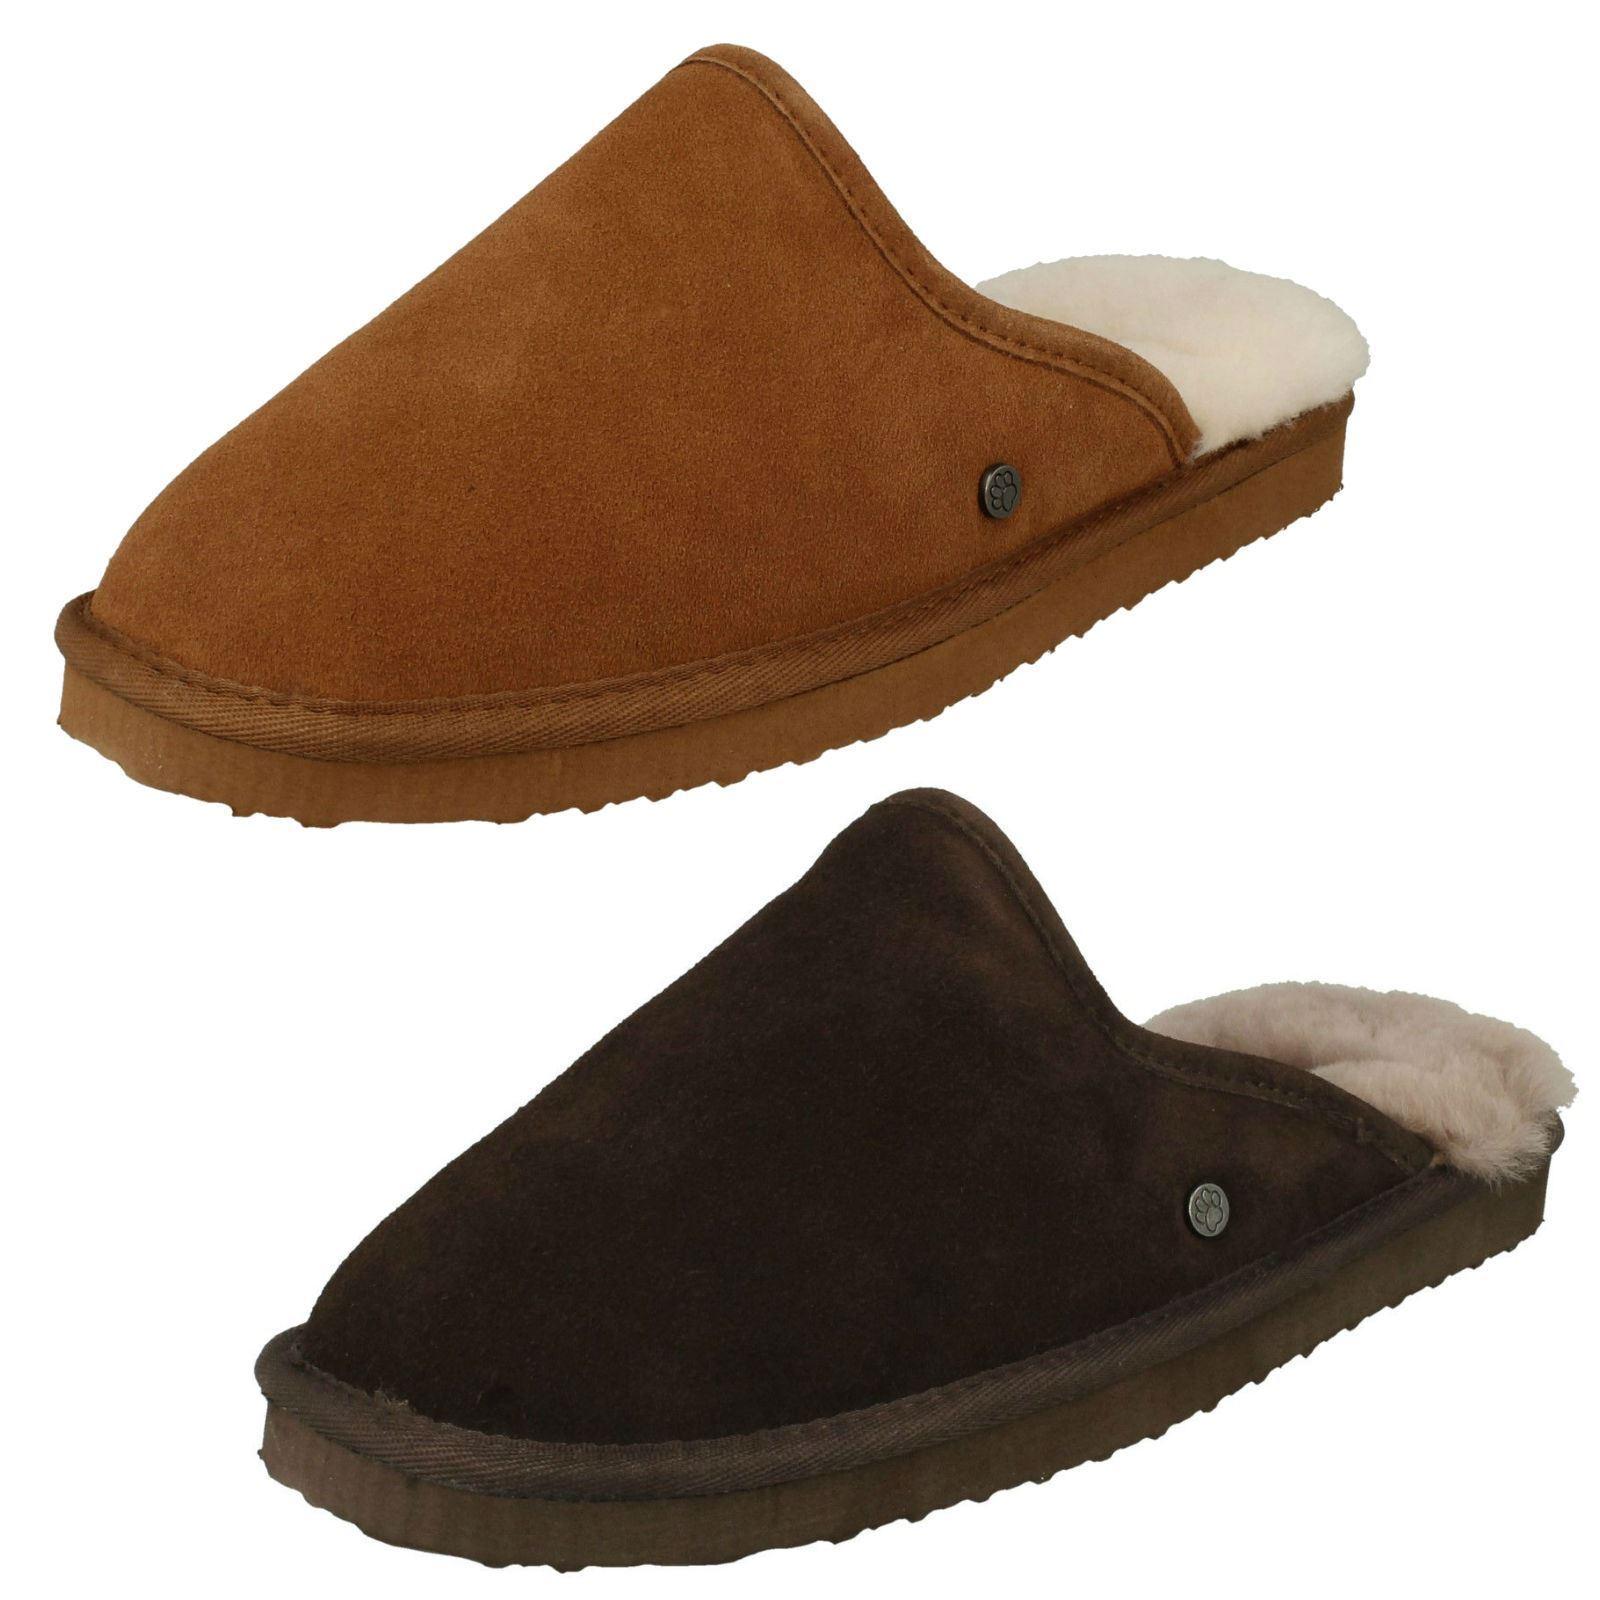 Mens Padders Genuine Sheepskin Lined Slip On 100% Leather Mule Slippers Nevis